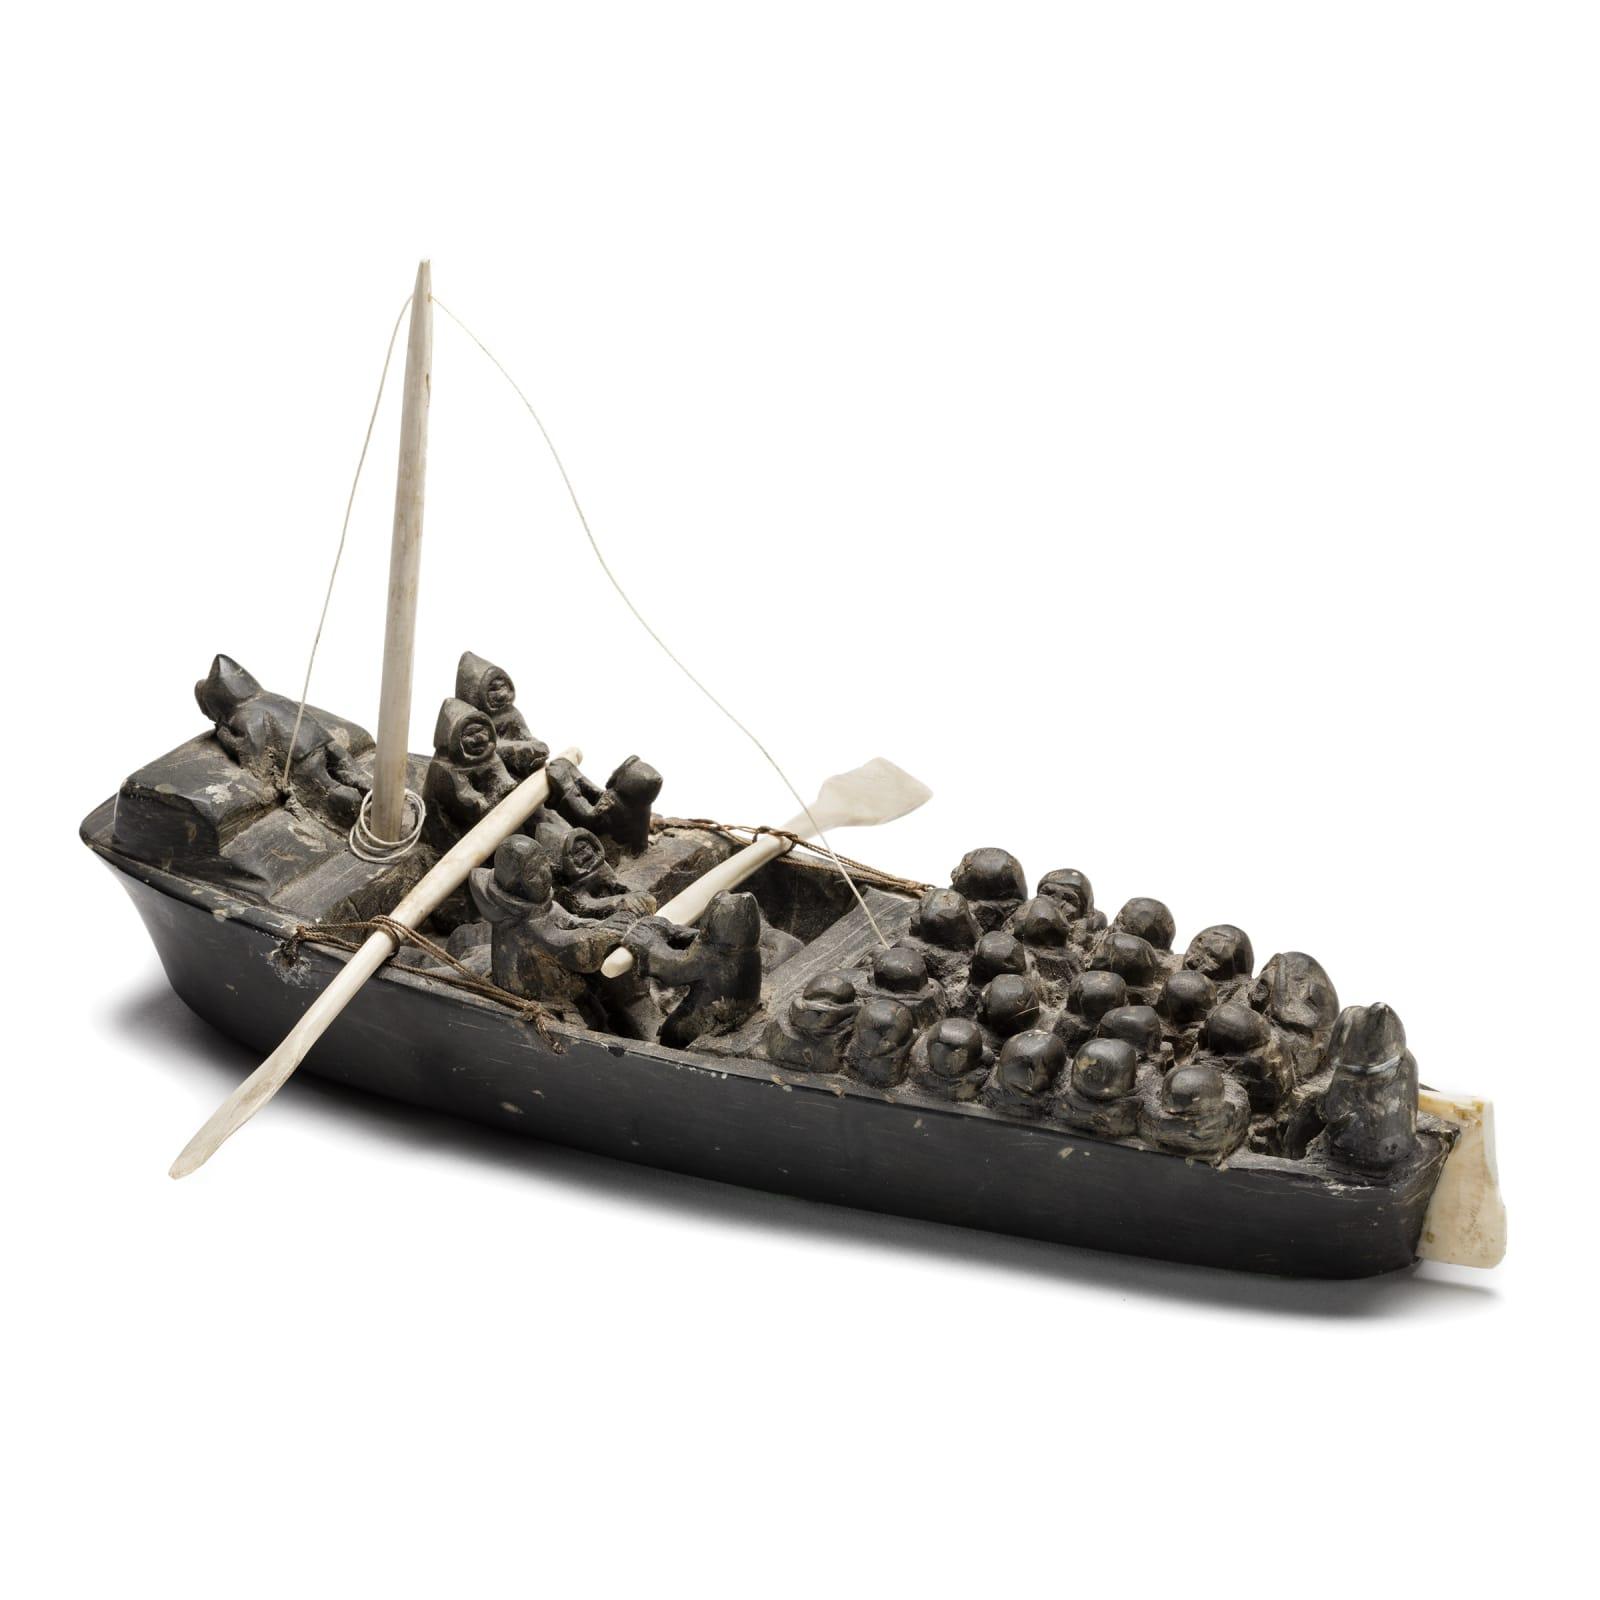 ENNUTSIAK (1896-1967) IQALUIT (FROBISHER BAY)  Umiaq Migration, late 1950s  REALIZED: $66,000